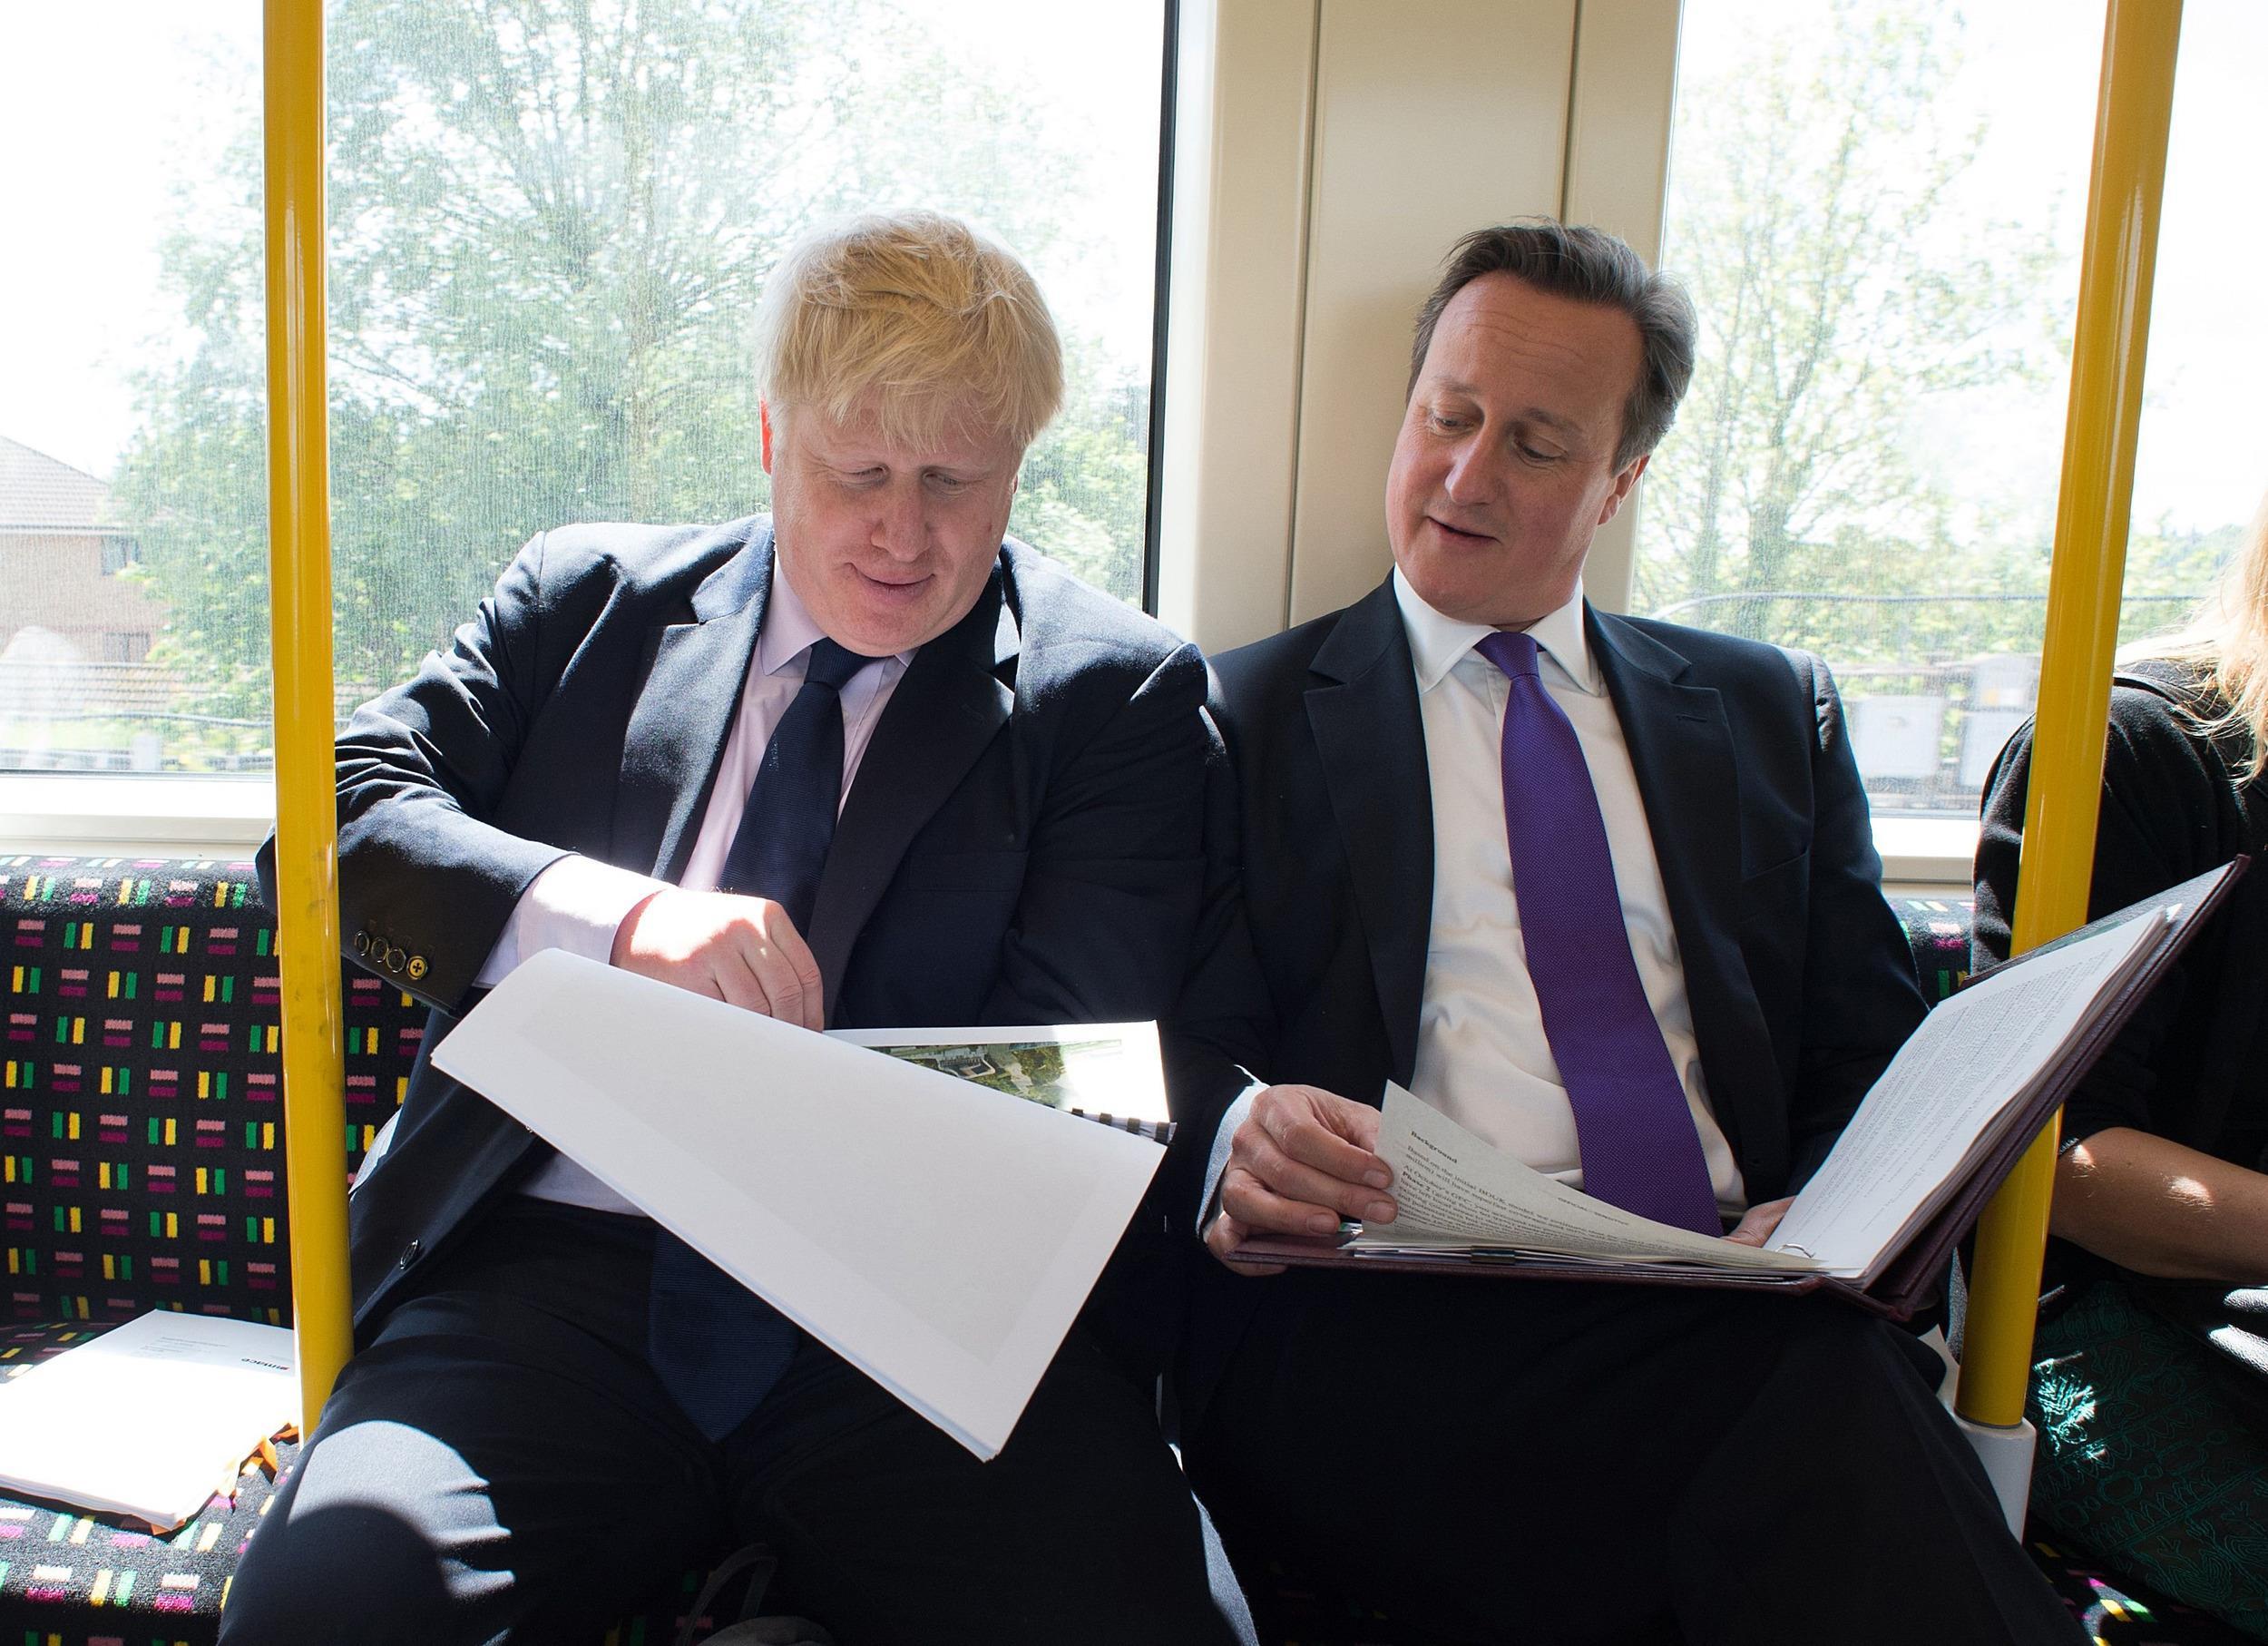 Image: Mayor of London Boris Johnson and British Prime Minister David Cameron on May 12